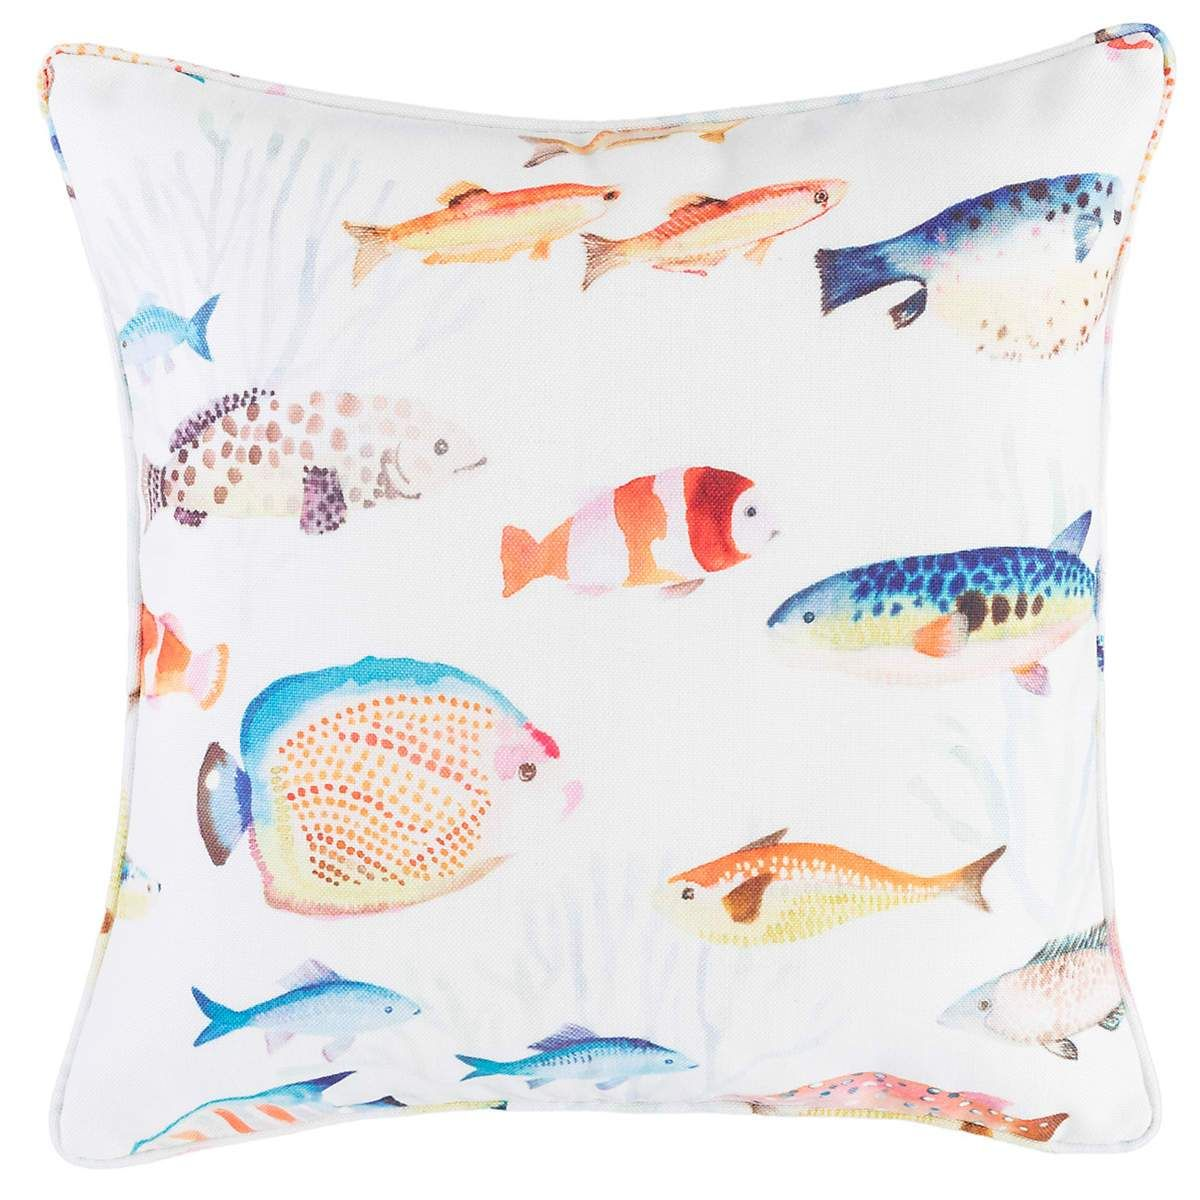 Pine cone hill happy fish indooroutdoor decorative pillow in